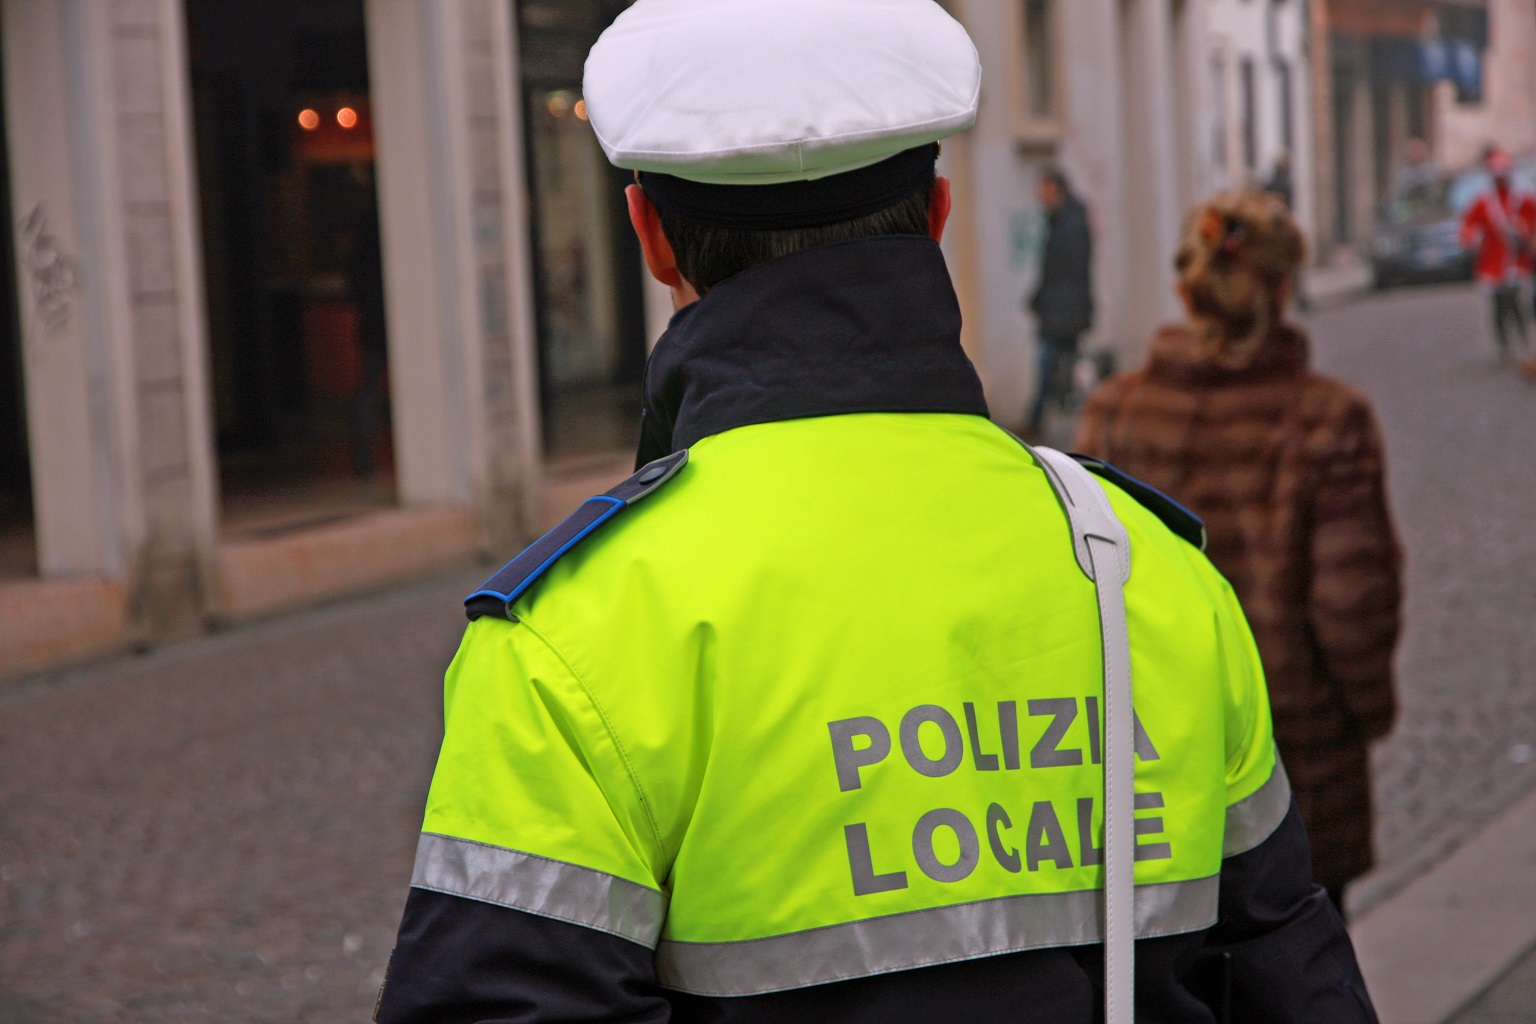 polizia locale sniffer palmari